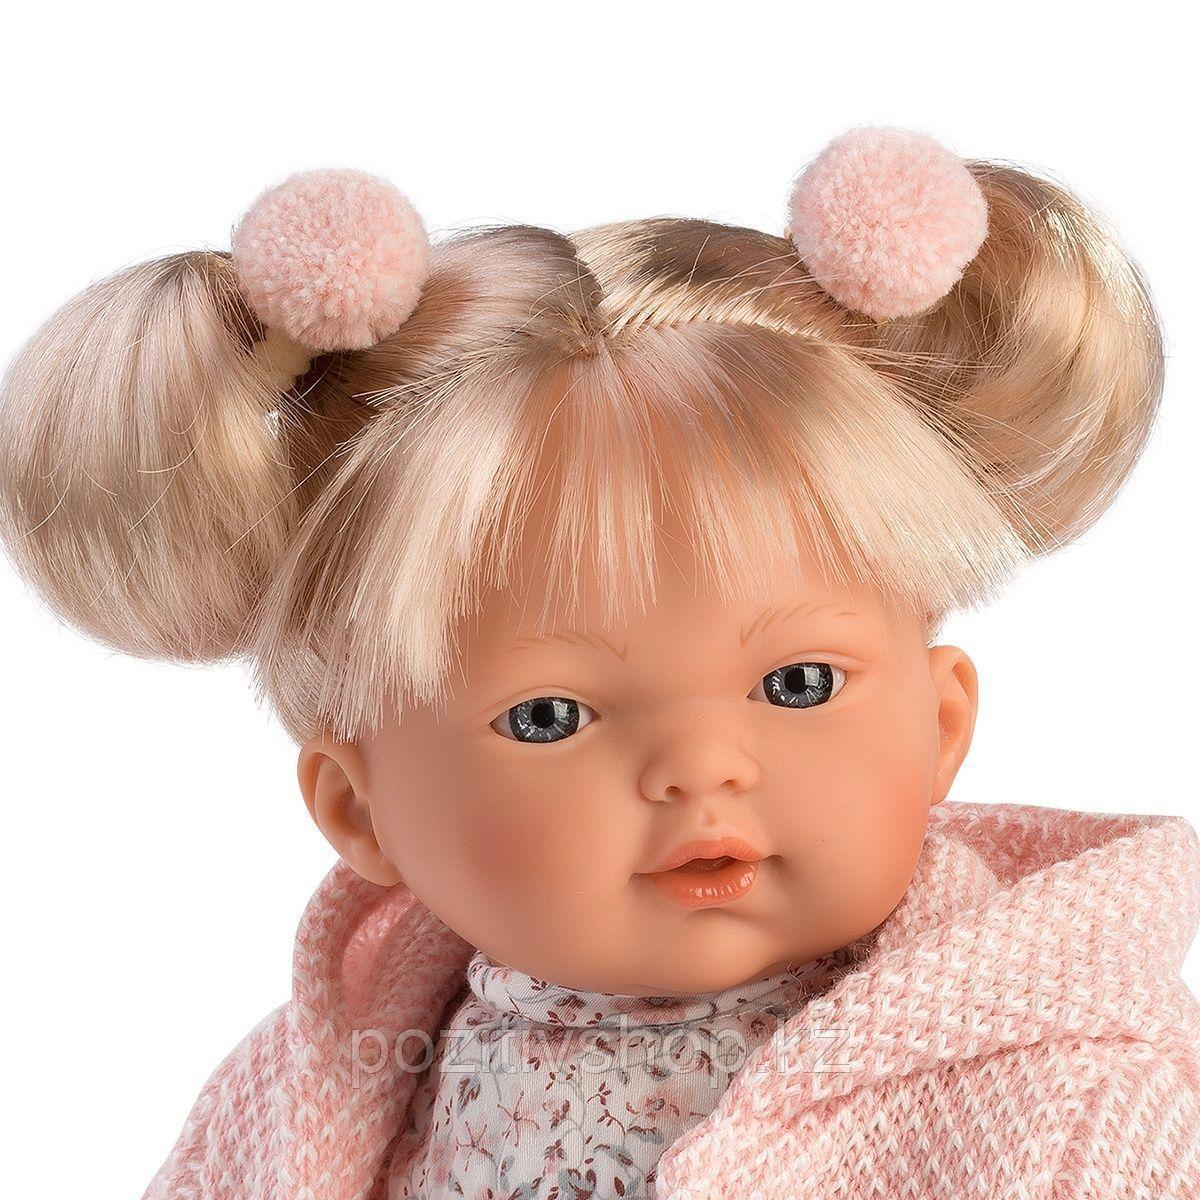 Кукла Llorens Роберта 33 см. блондинка в светло-розовом жакете - фото 2